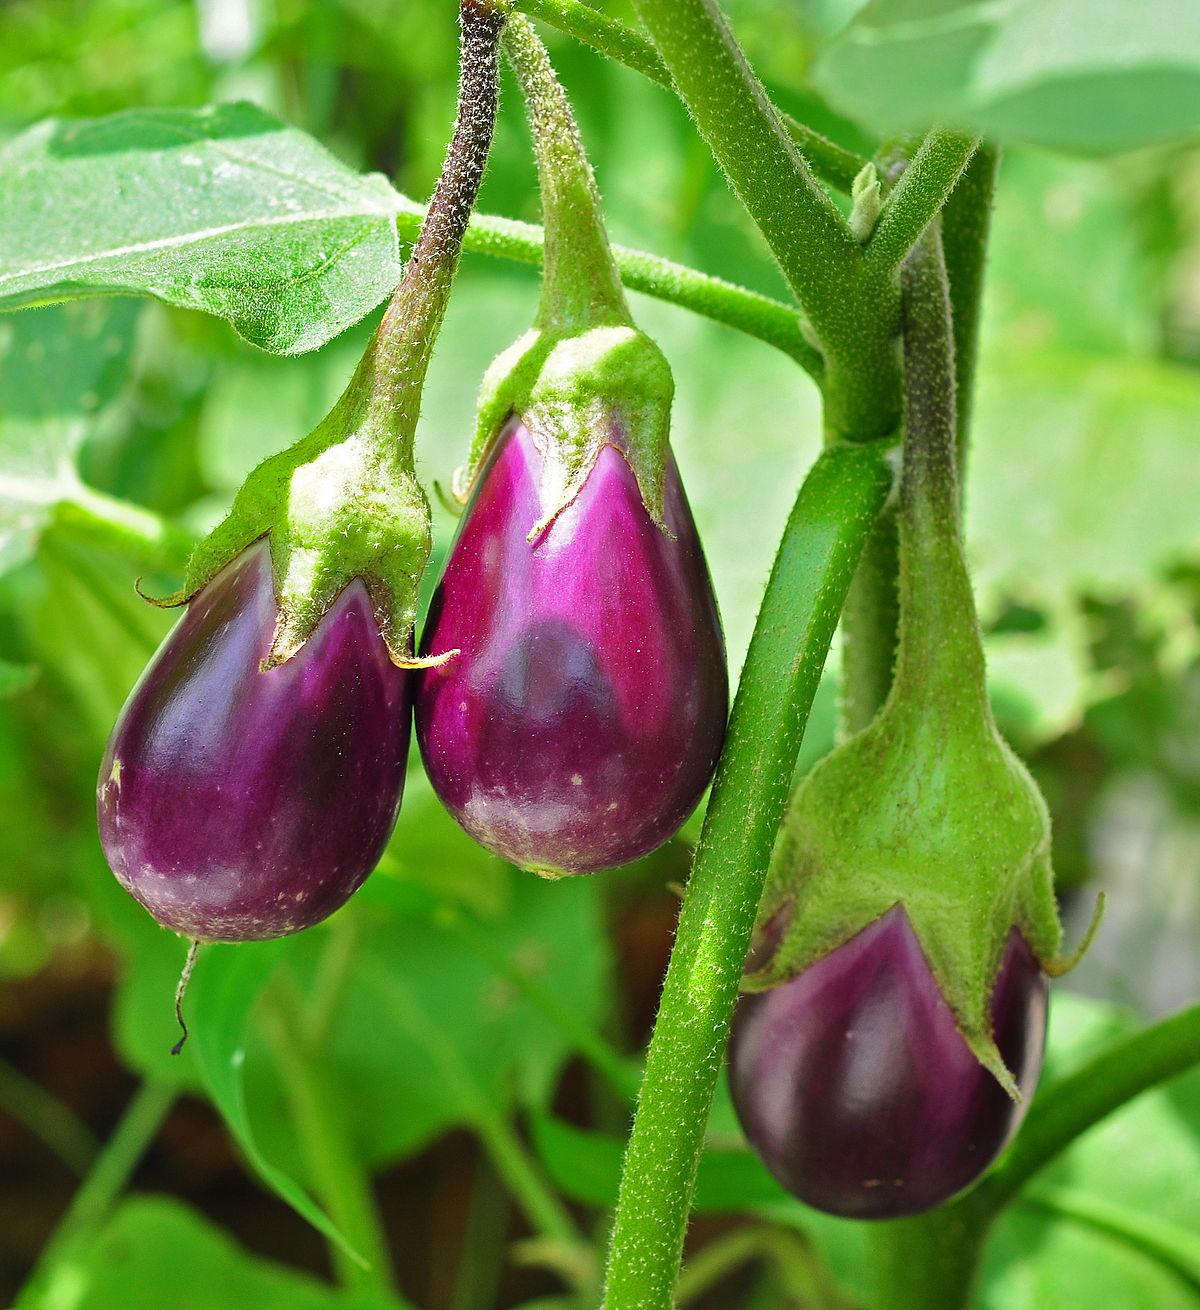 Plant Guide: Eggplant  Growing Eggplant, Growing Eggplant From Seed, Vegetable Gardening, Vegetable Gardening for Beginners, Vegetable Garden, Garden Ideas, Gardening